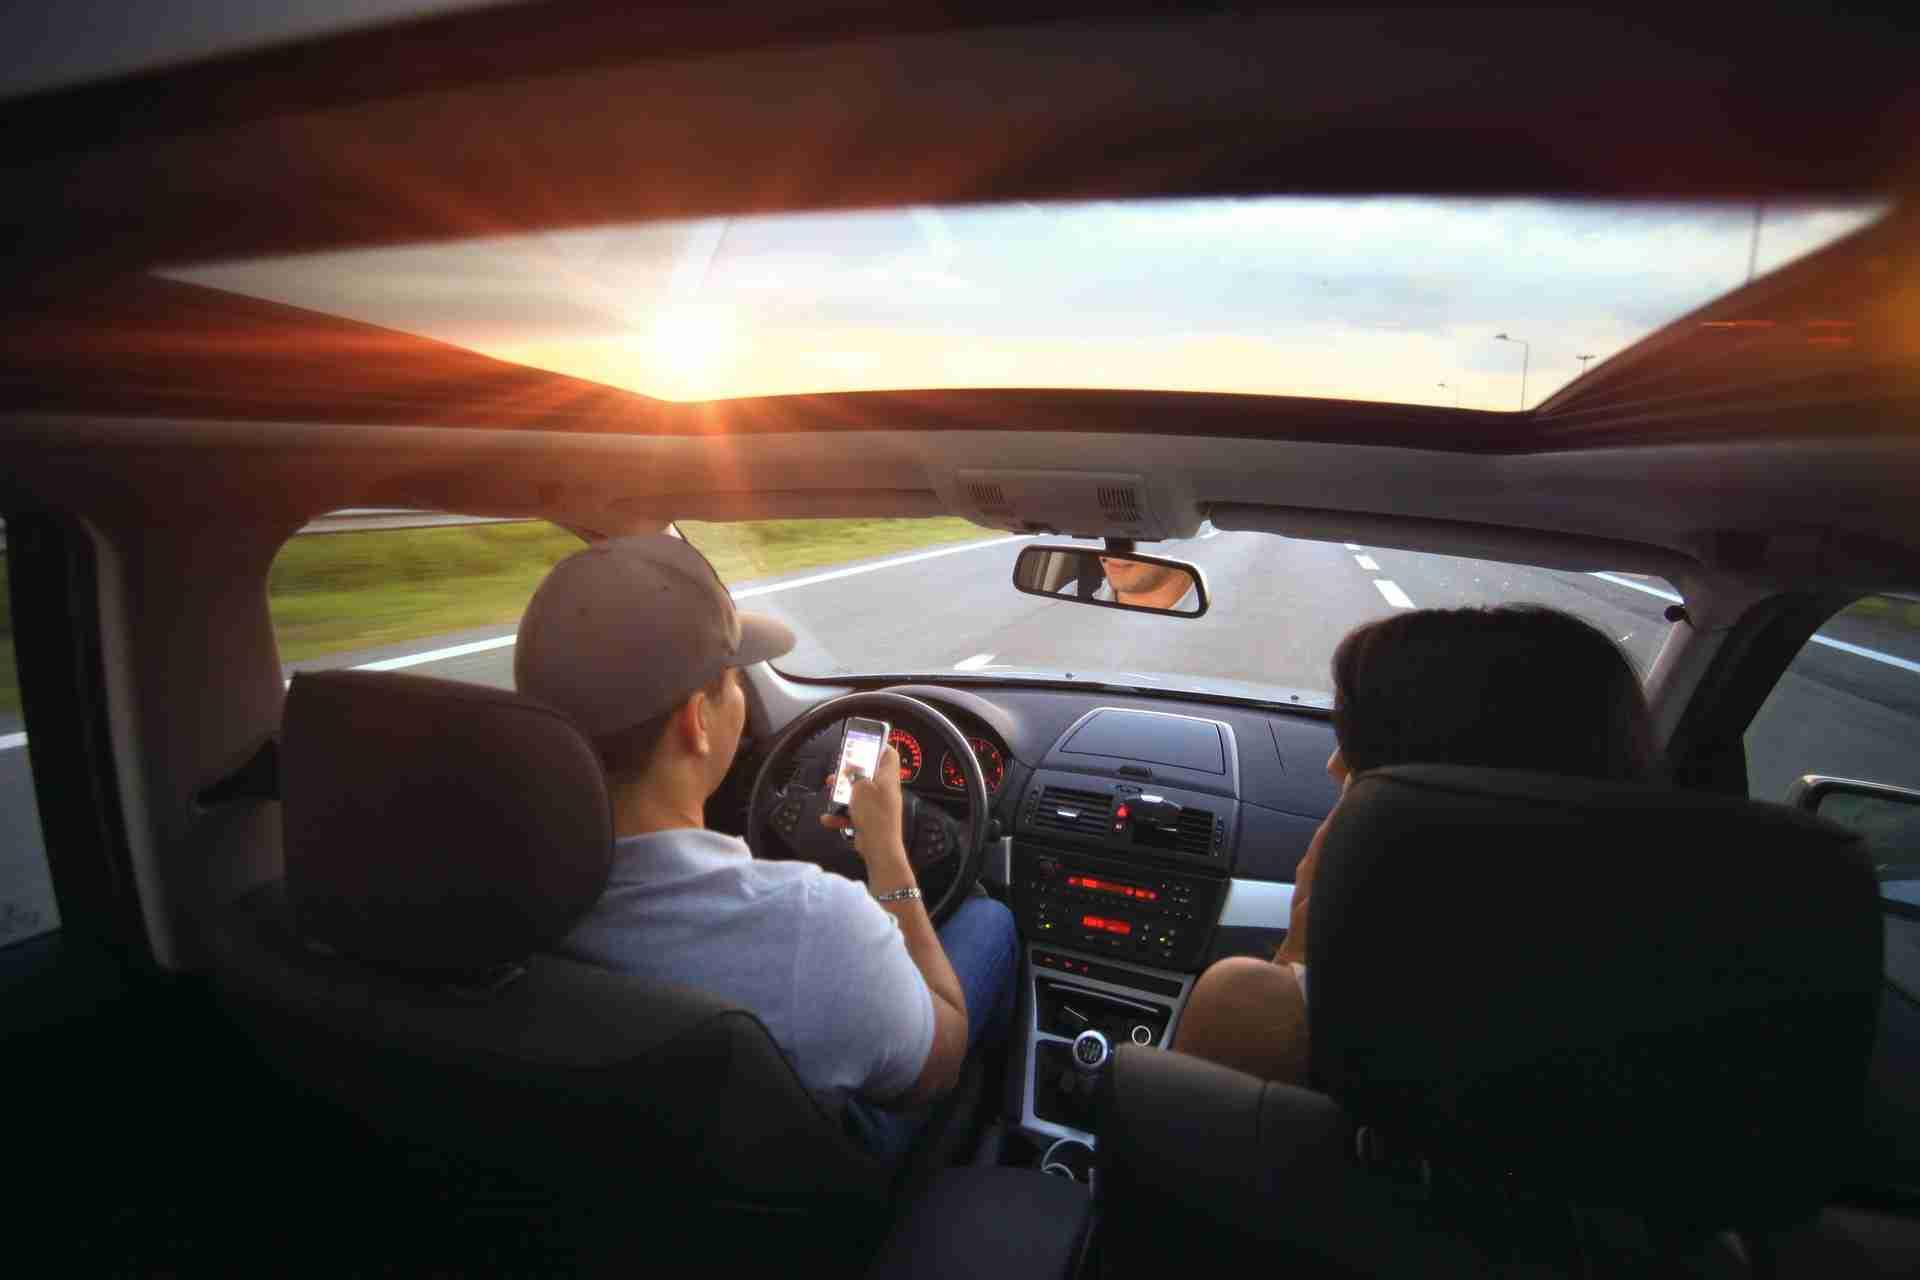 Zusatzfahrer Sixt